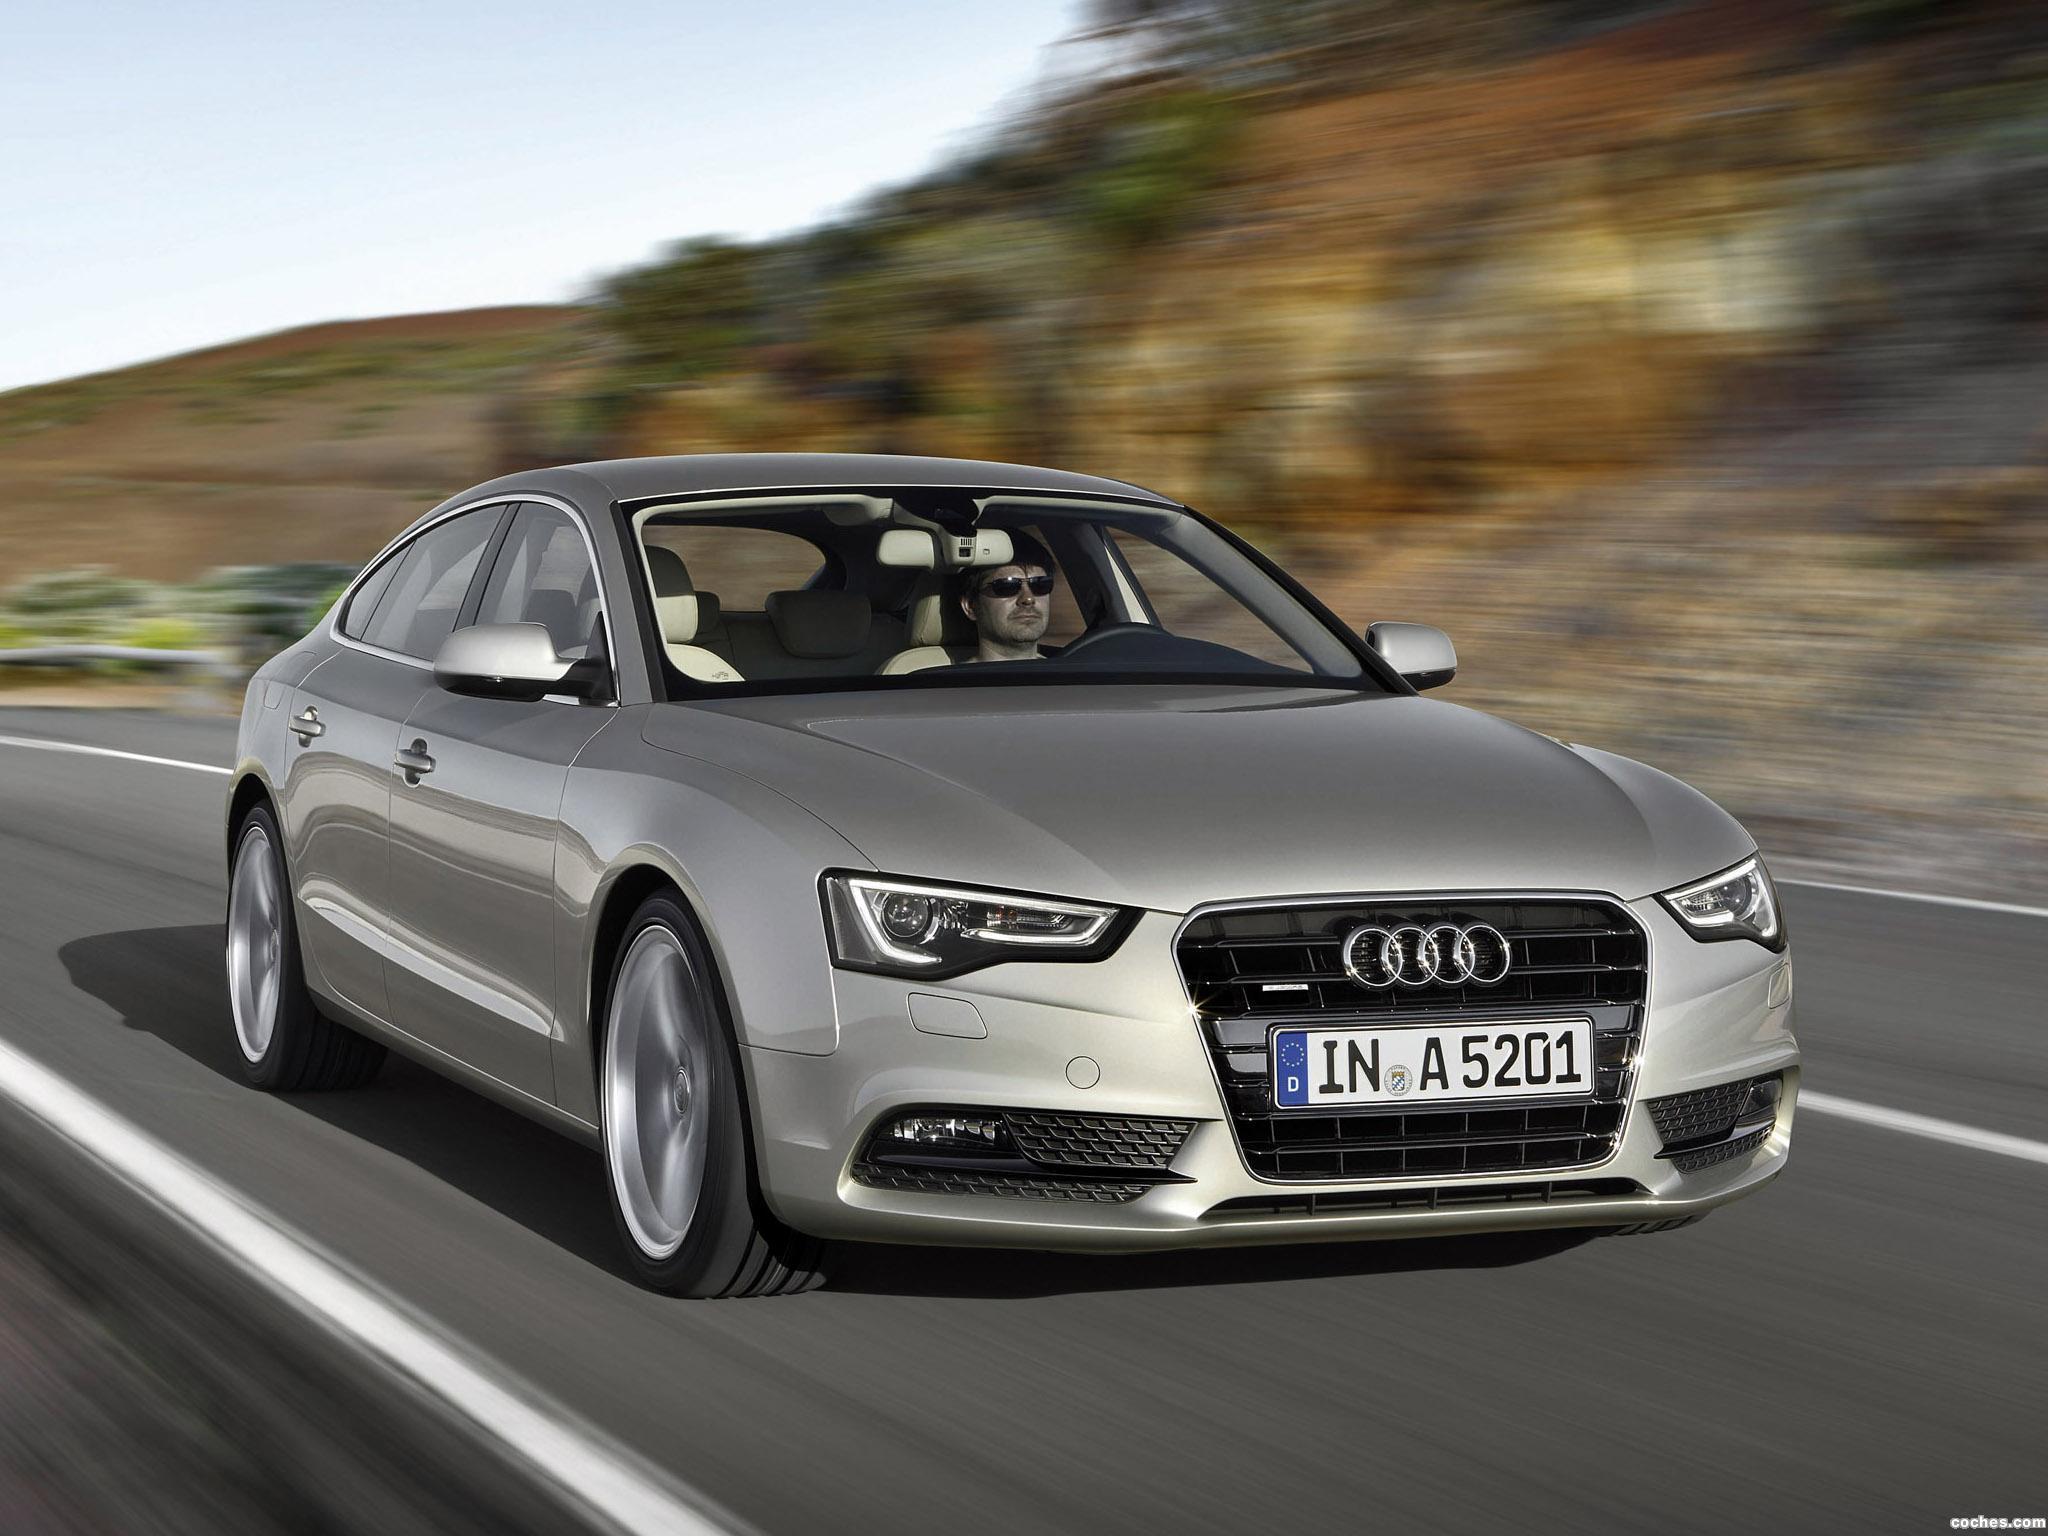 Foto 2 de Audi A5 Sportback 2011